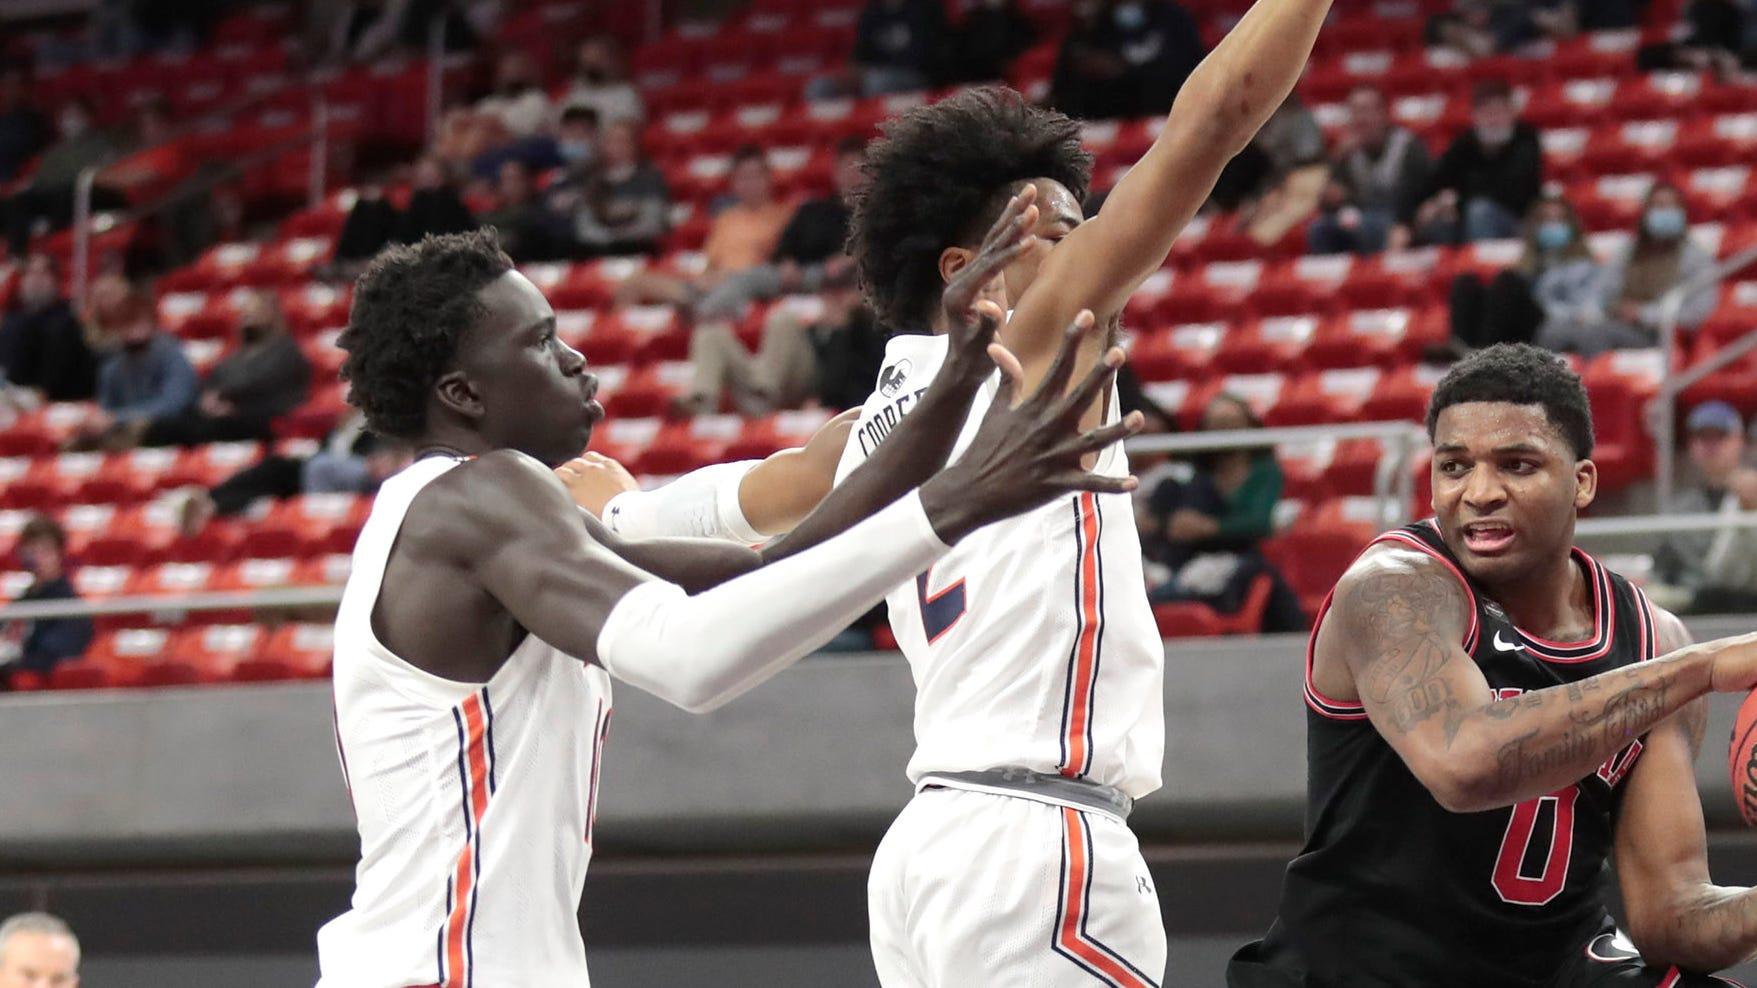 Auburn Basketball S Sharife Cooper Jt Thor At 2021 Nba Draft Combine